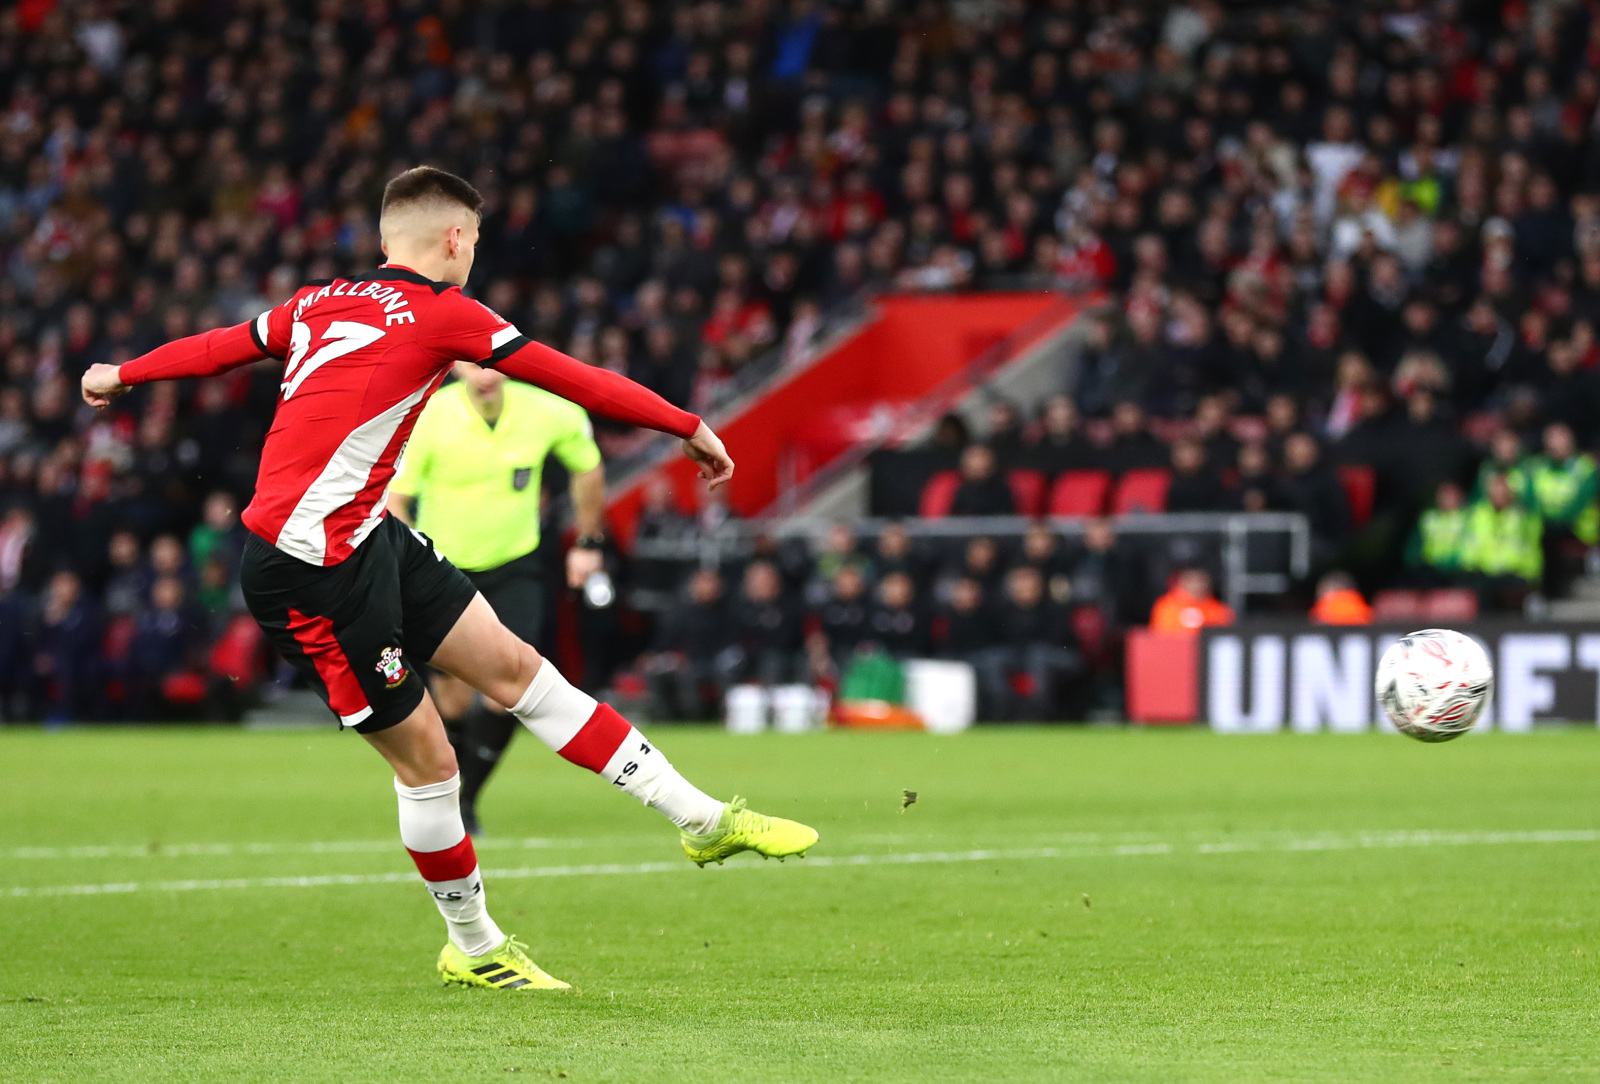 Southampton: Saints midfielder Will Smallbone reacts to FA Cup heroics